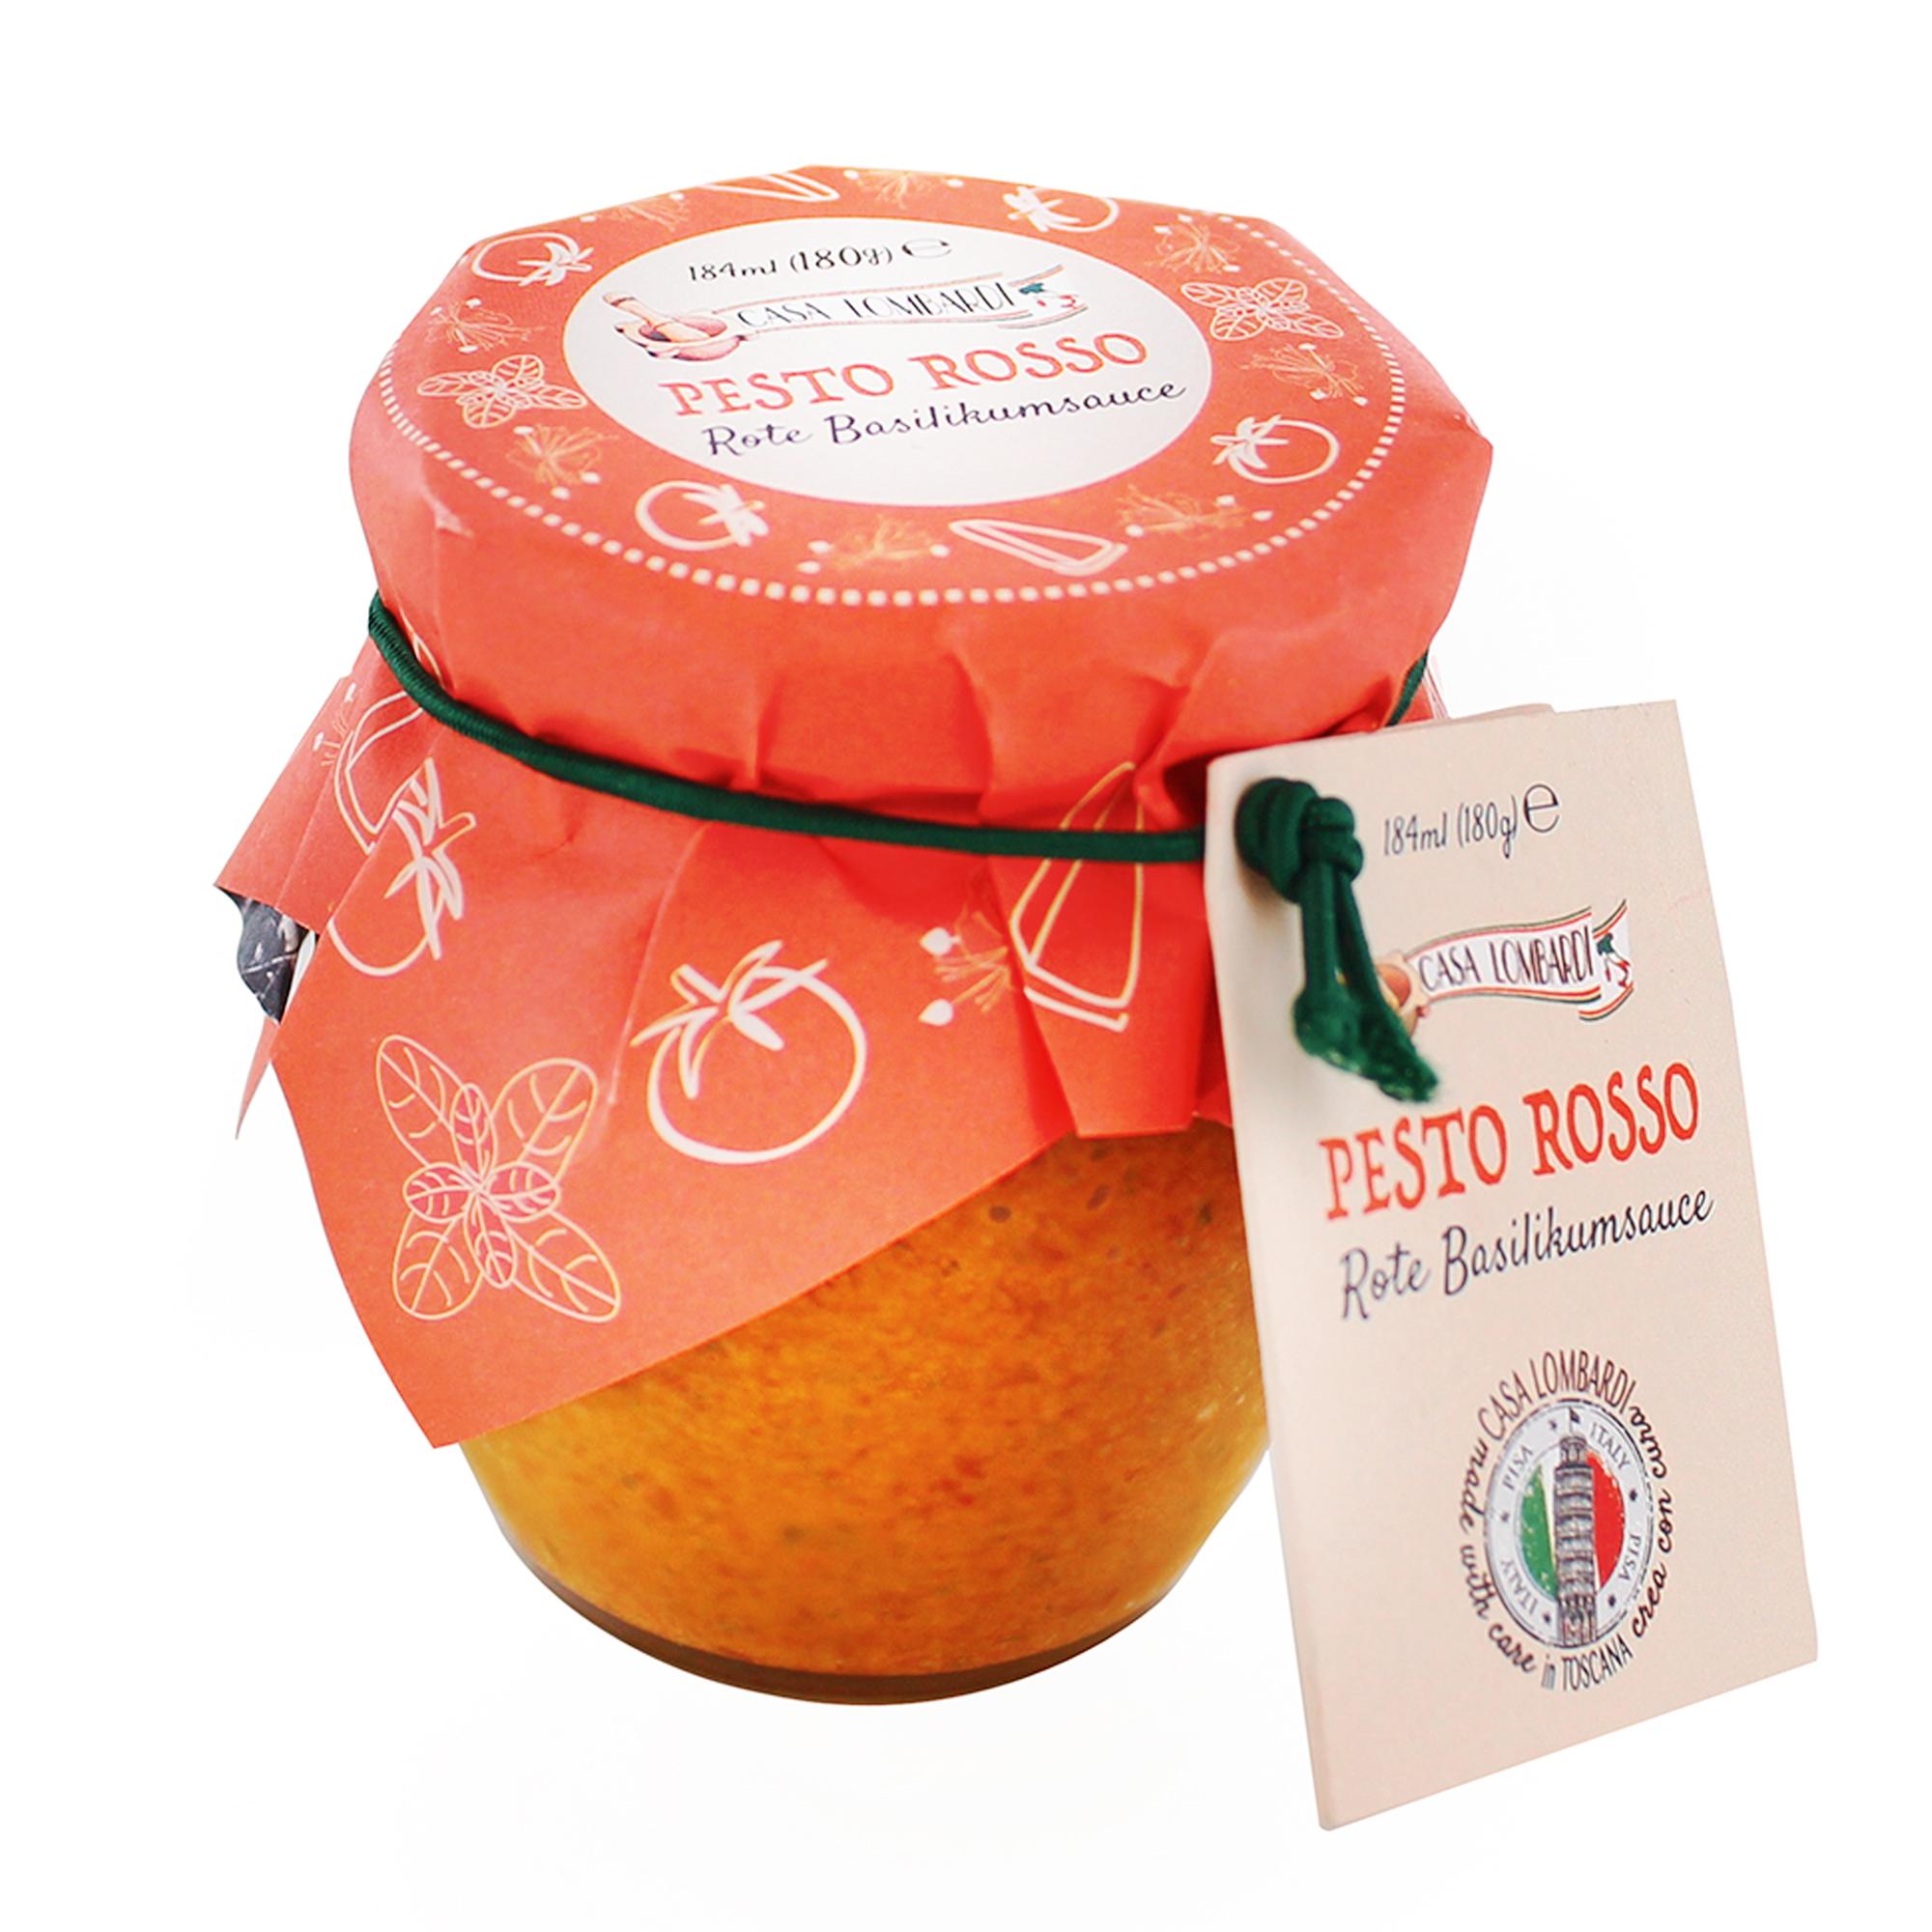 Crema Lombardi Pesto Rosso Toscano 180g